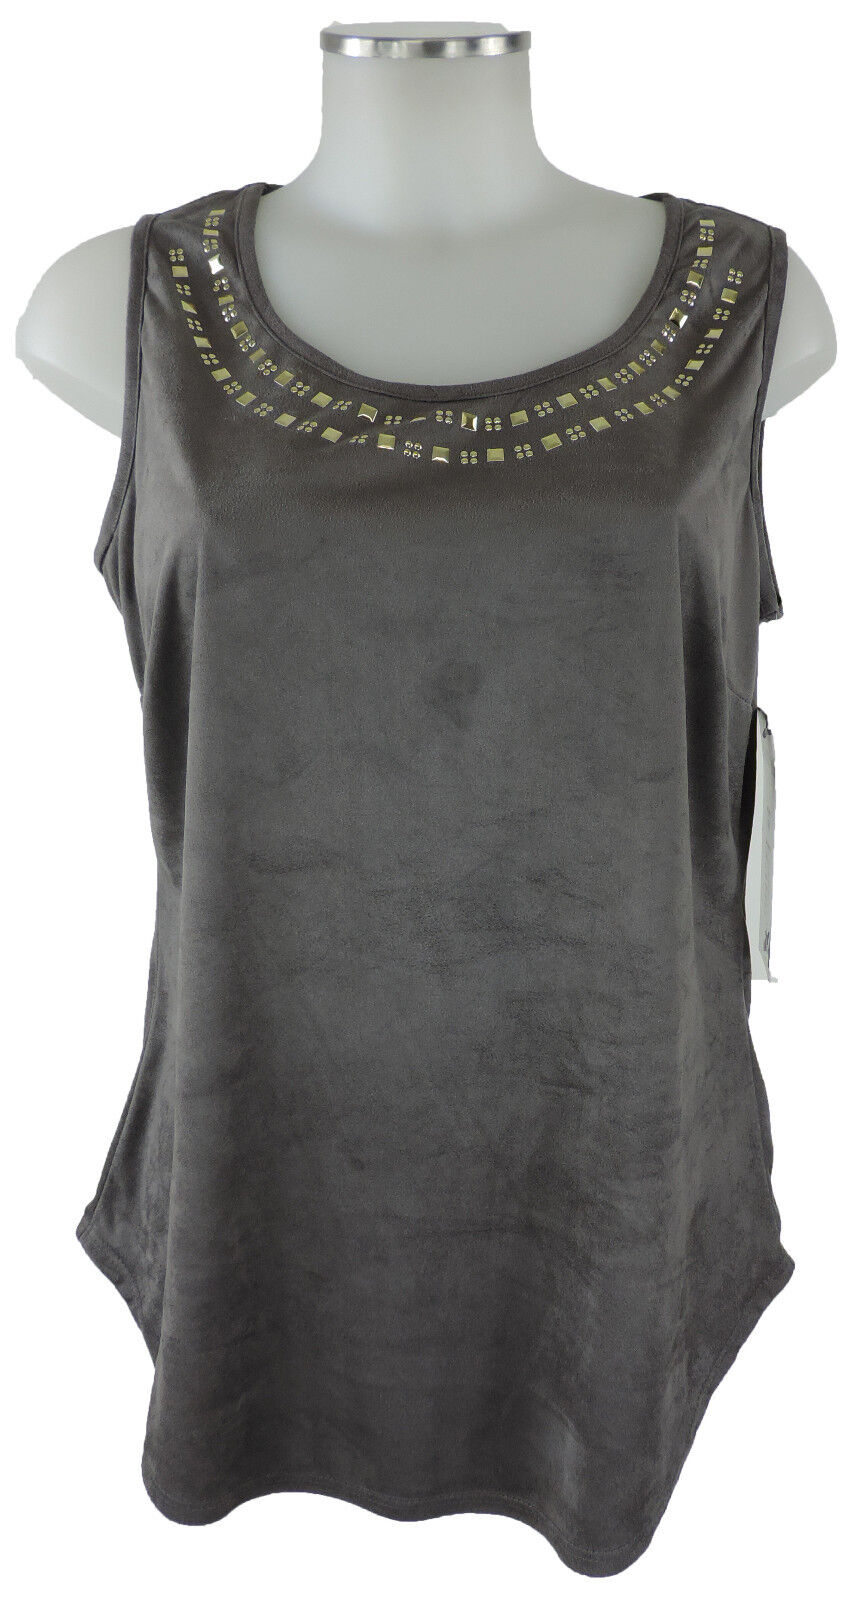 Frank Lyman Shirt 38 (D) 10 (US) Top in Wildlederimitat beigegrigio Polyester neu